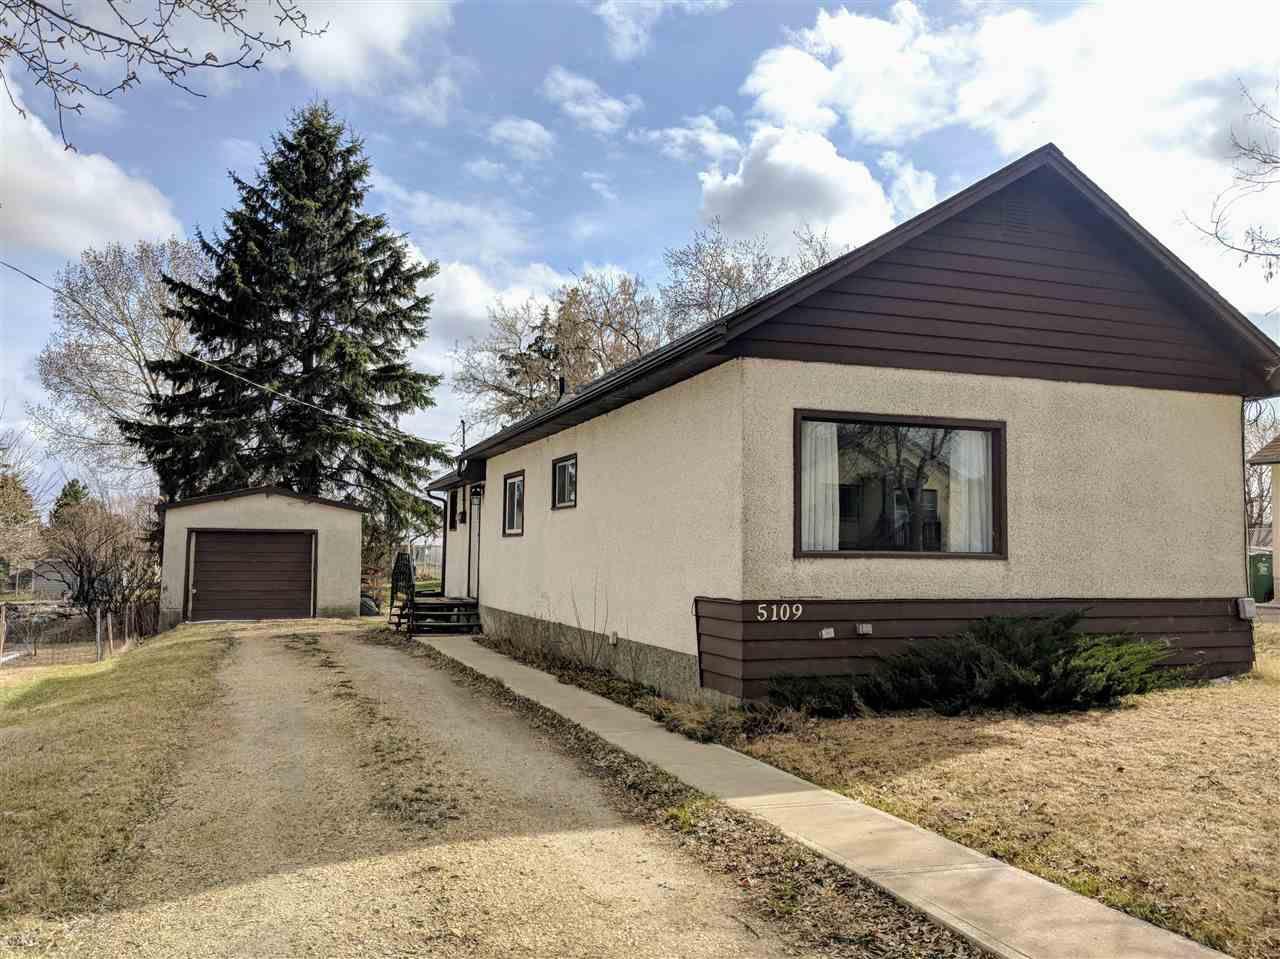 Main Photo: 5109 50 Avenue: Legal House for sale : MLS®# E4154480